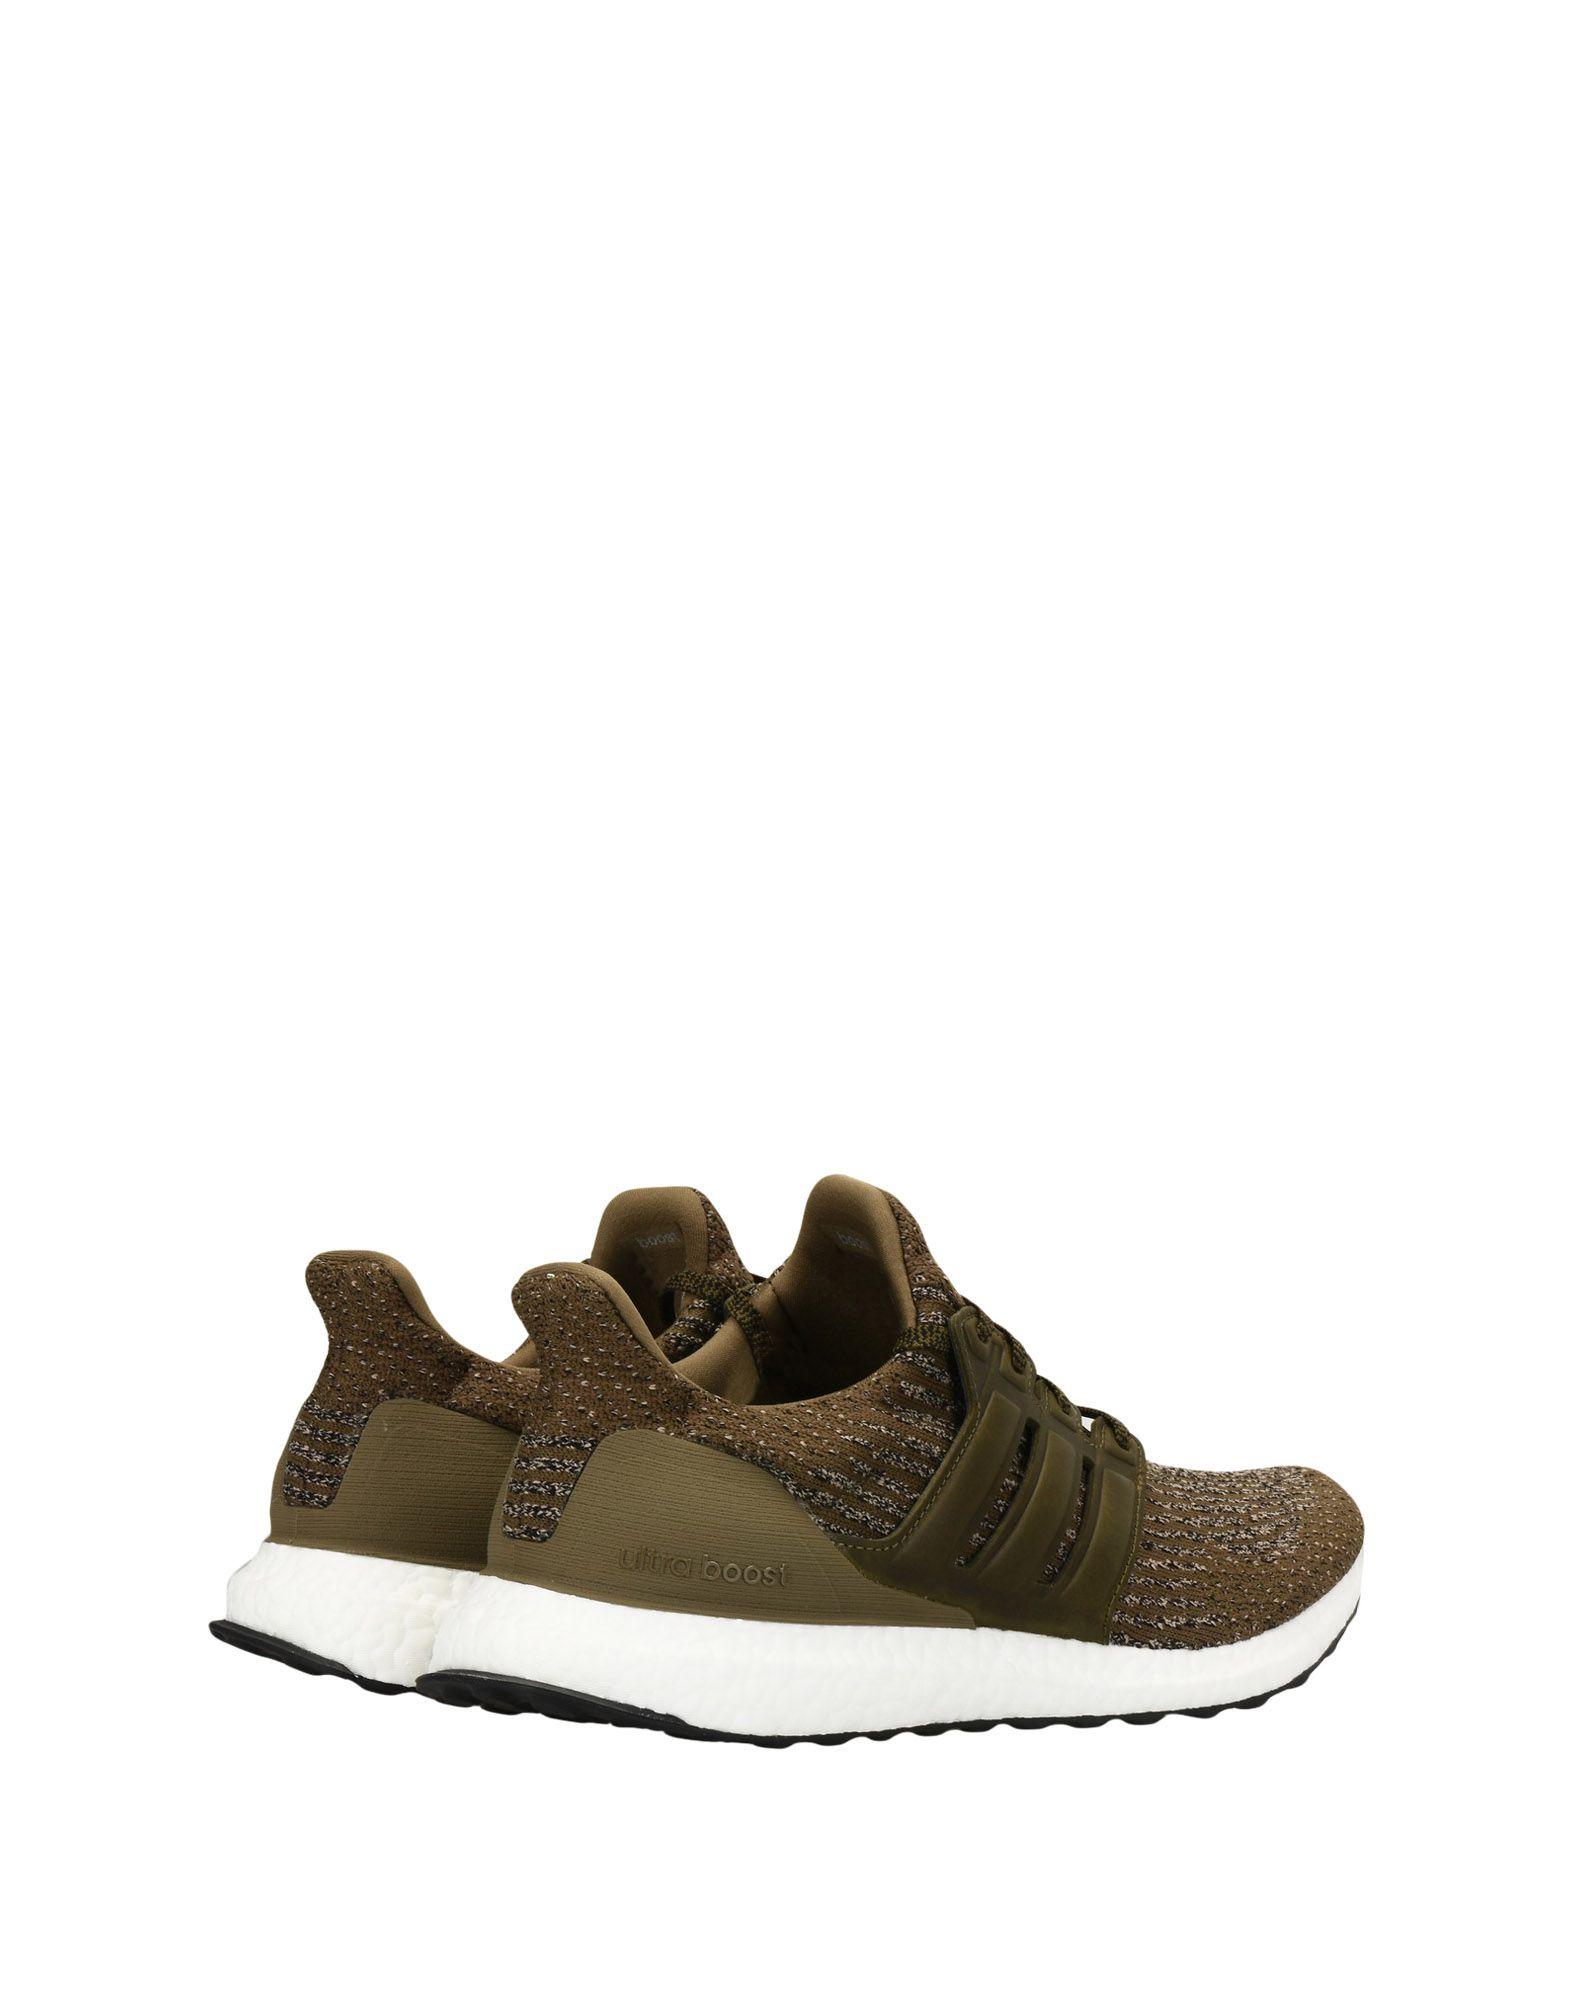 Haltbare Mode billige Schuhe Adidas Ultraboost  11325742DA Neue Schuhe Schuhe Schuhe 3fa407